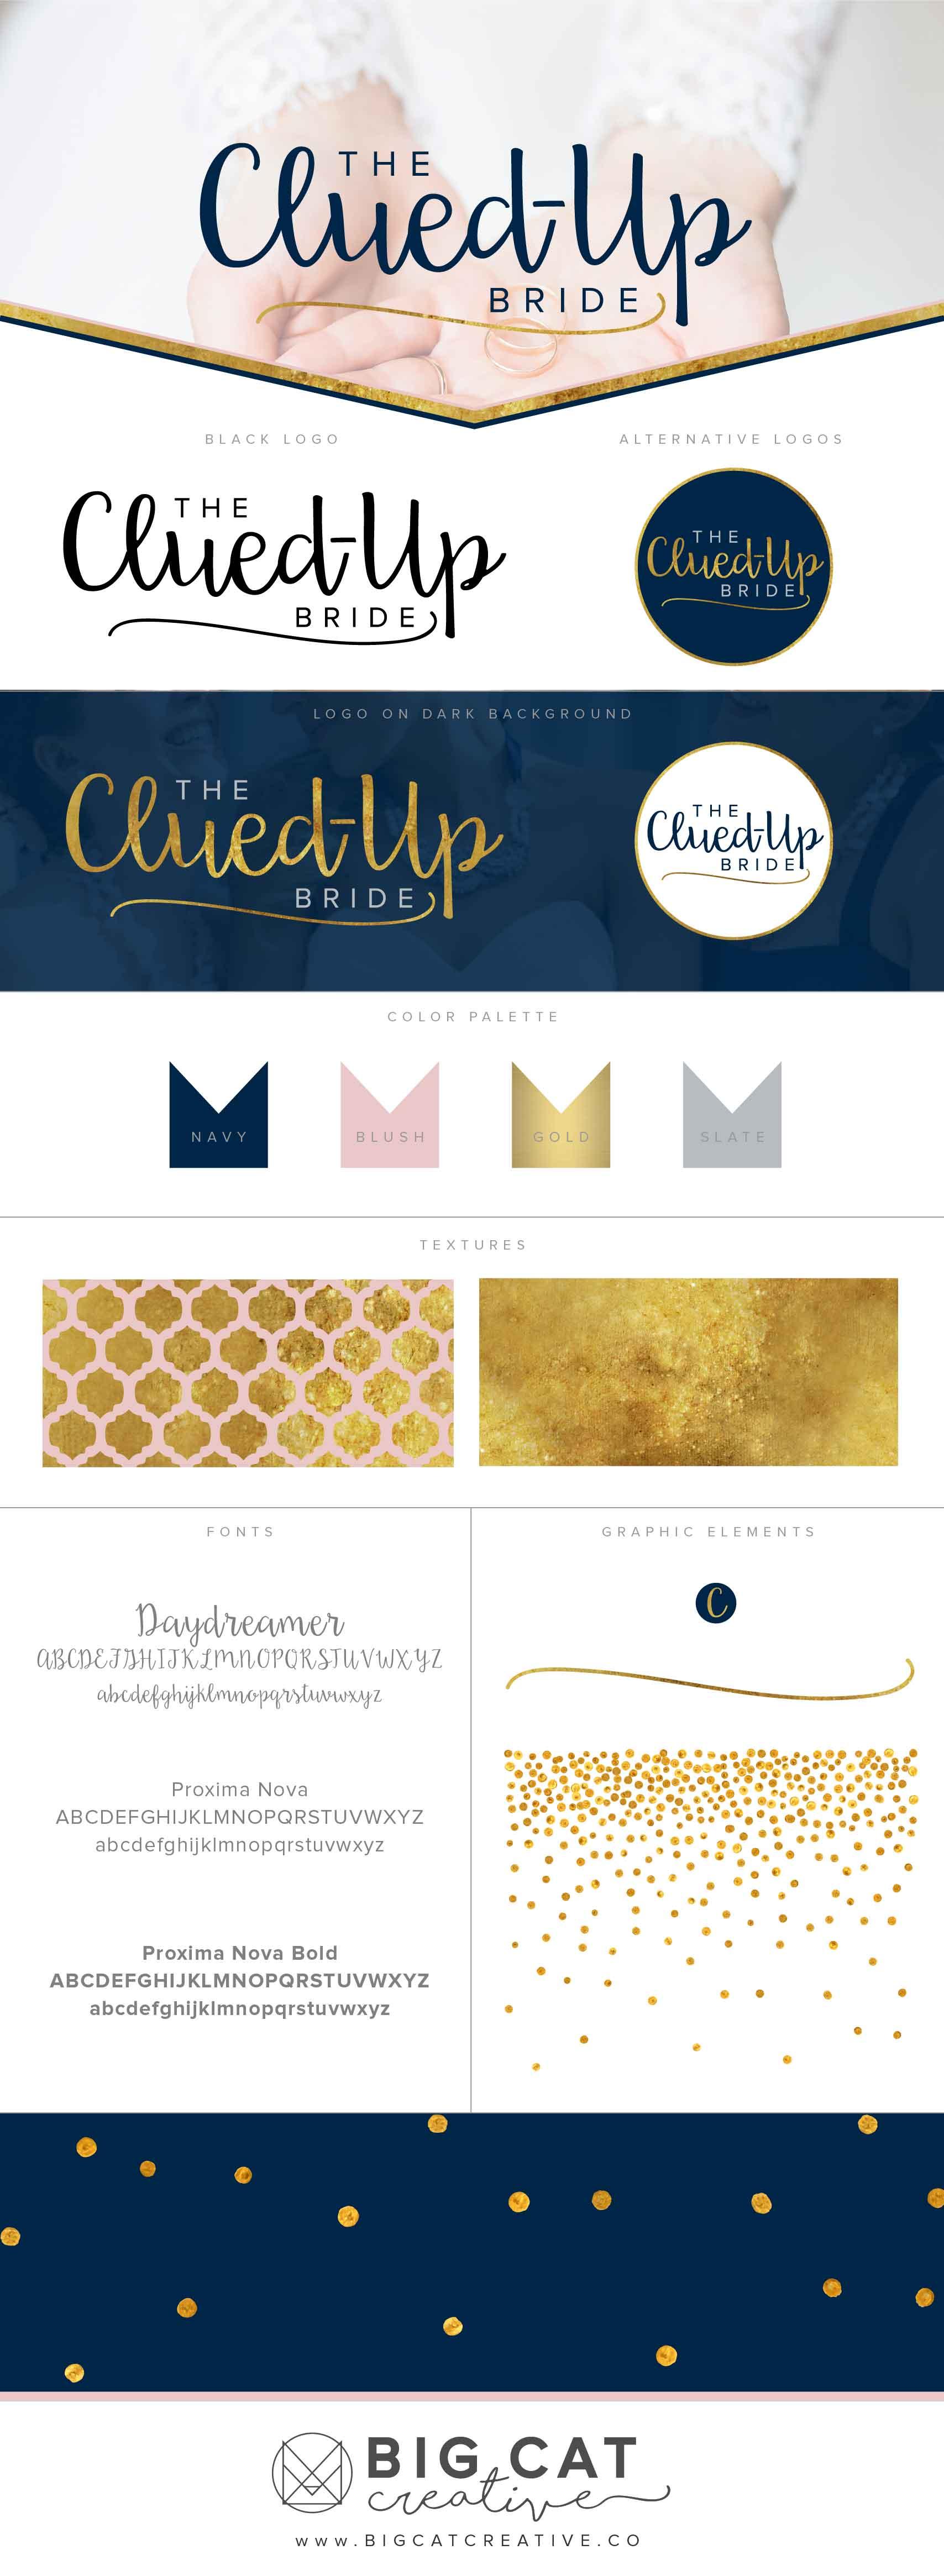 The Clued-Up Bride Branding Style Board | Branding + Logo Design